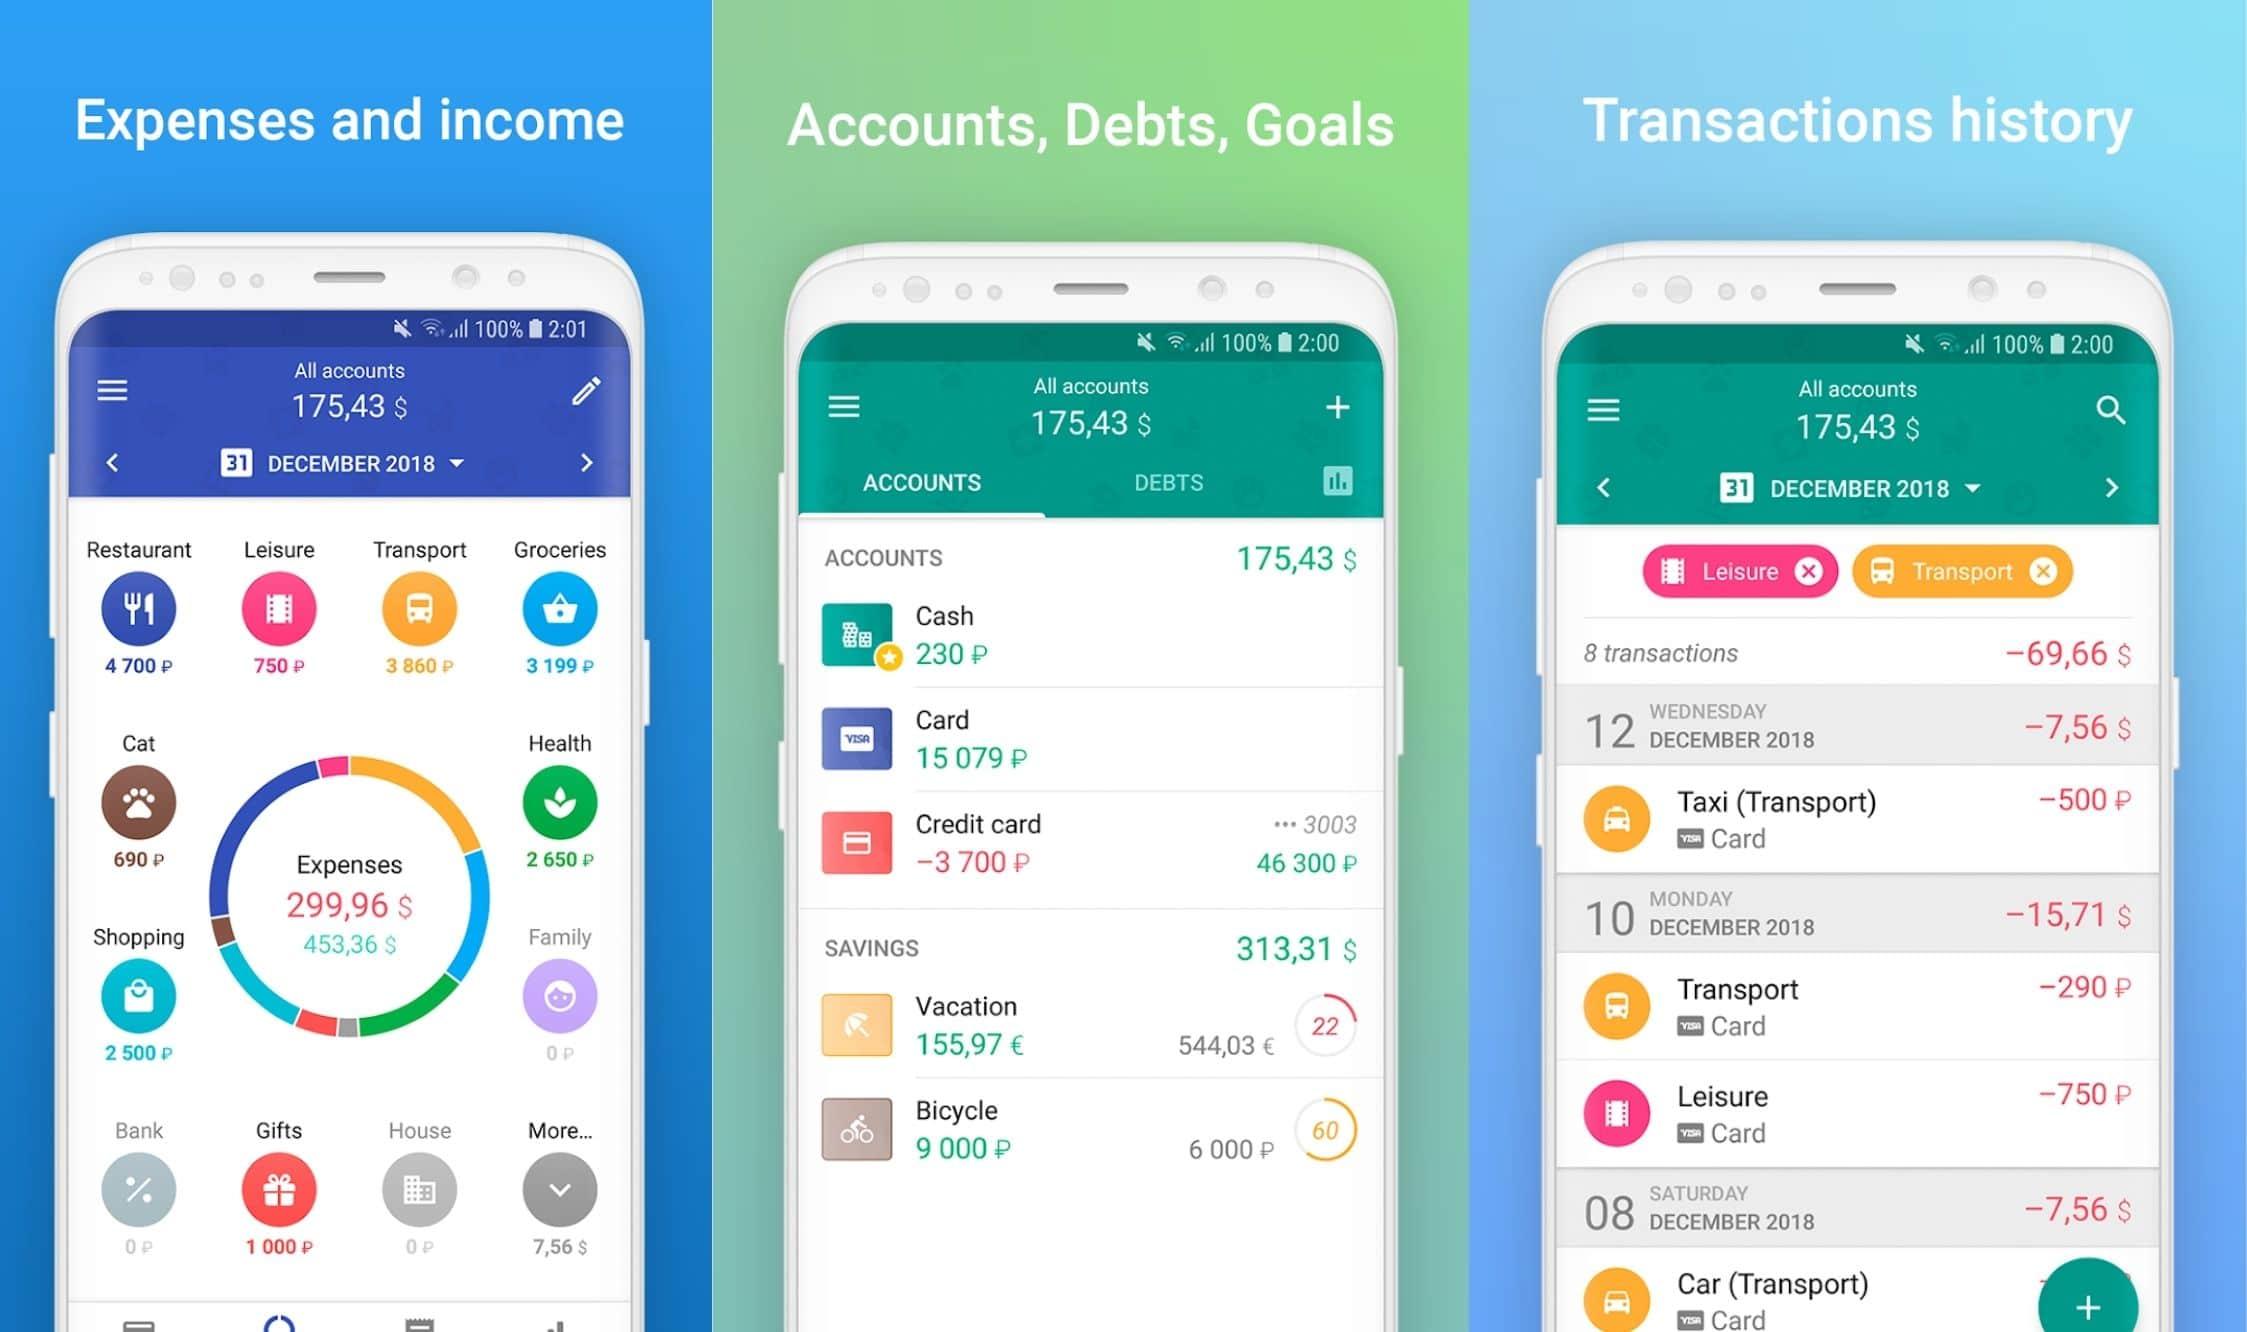 aplikasi pengatur keuangan 1money